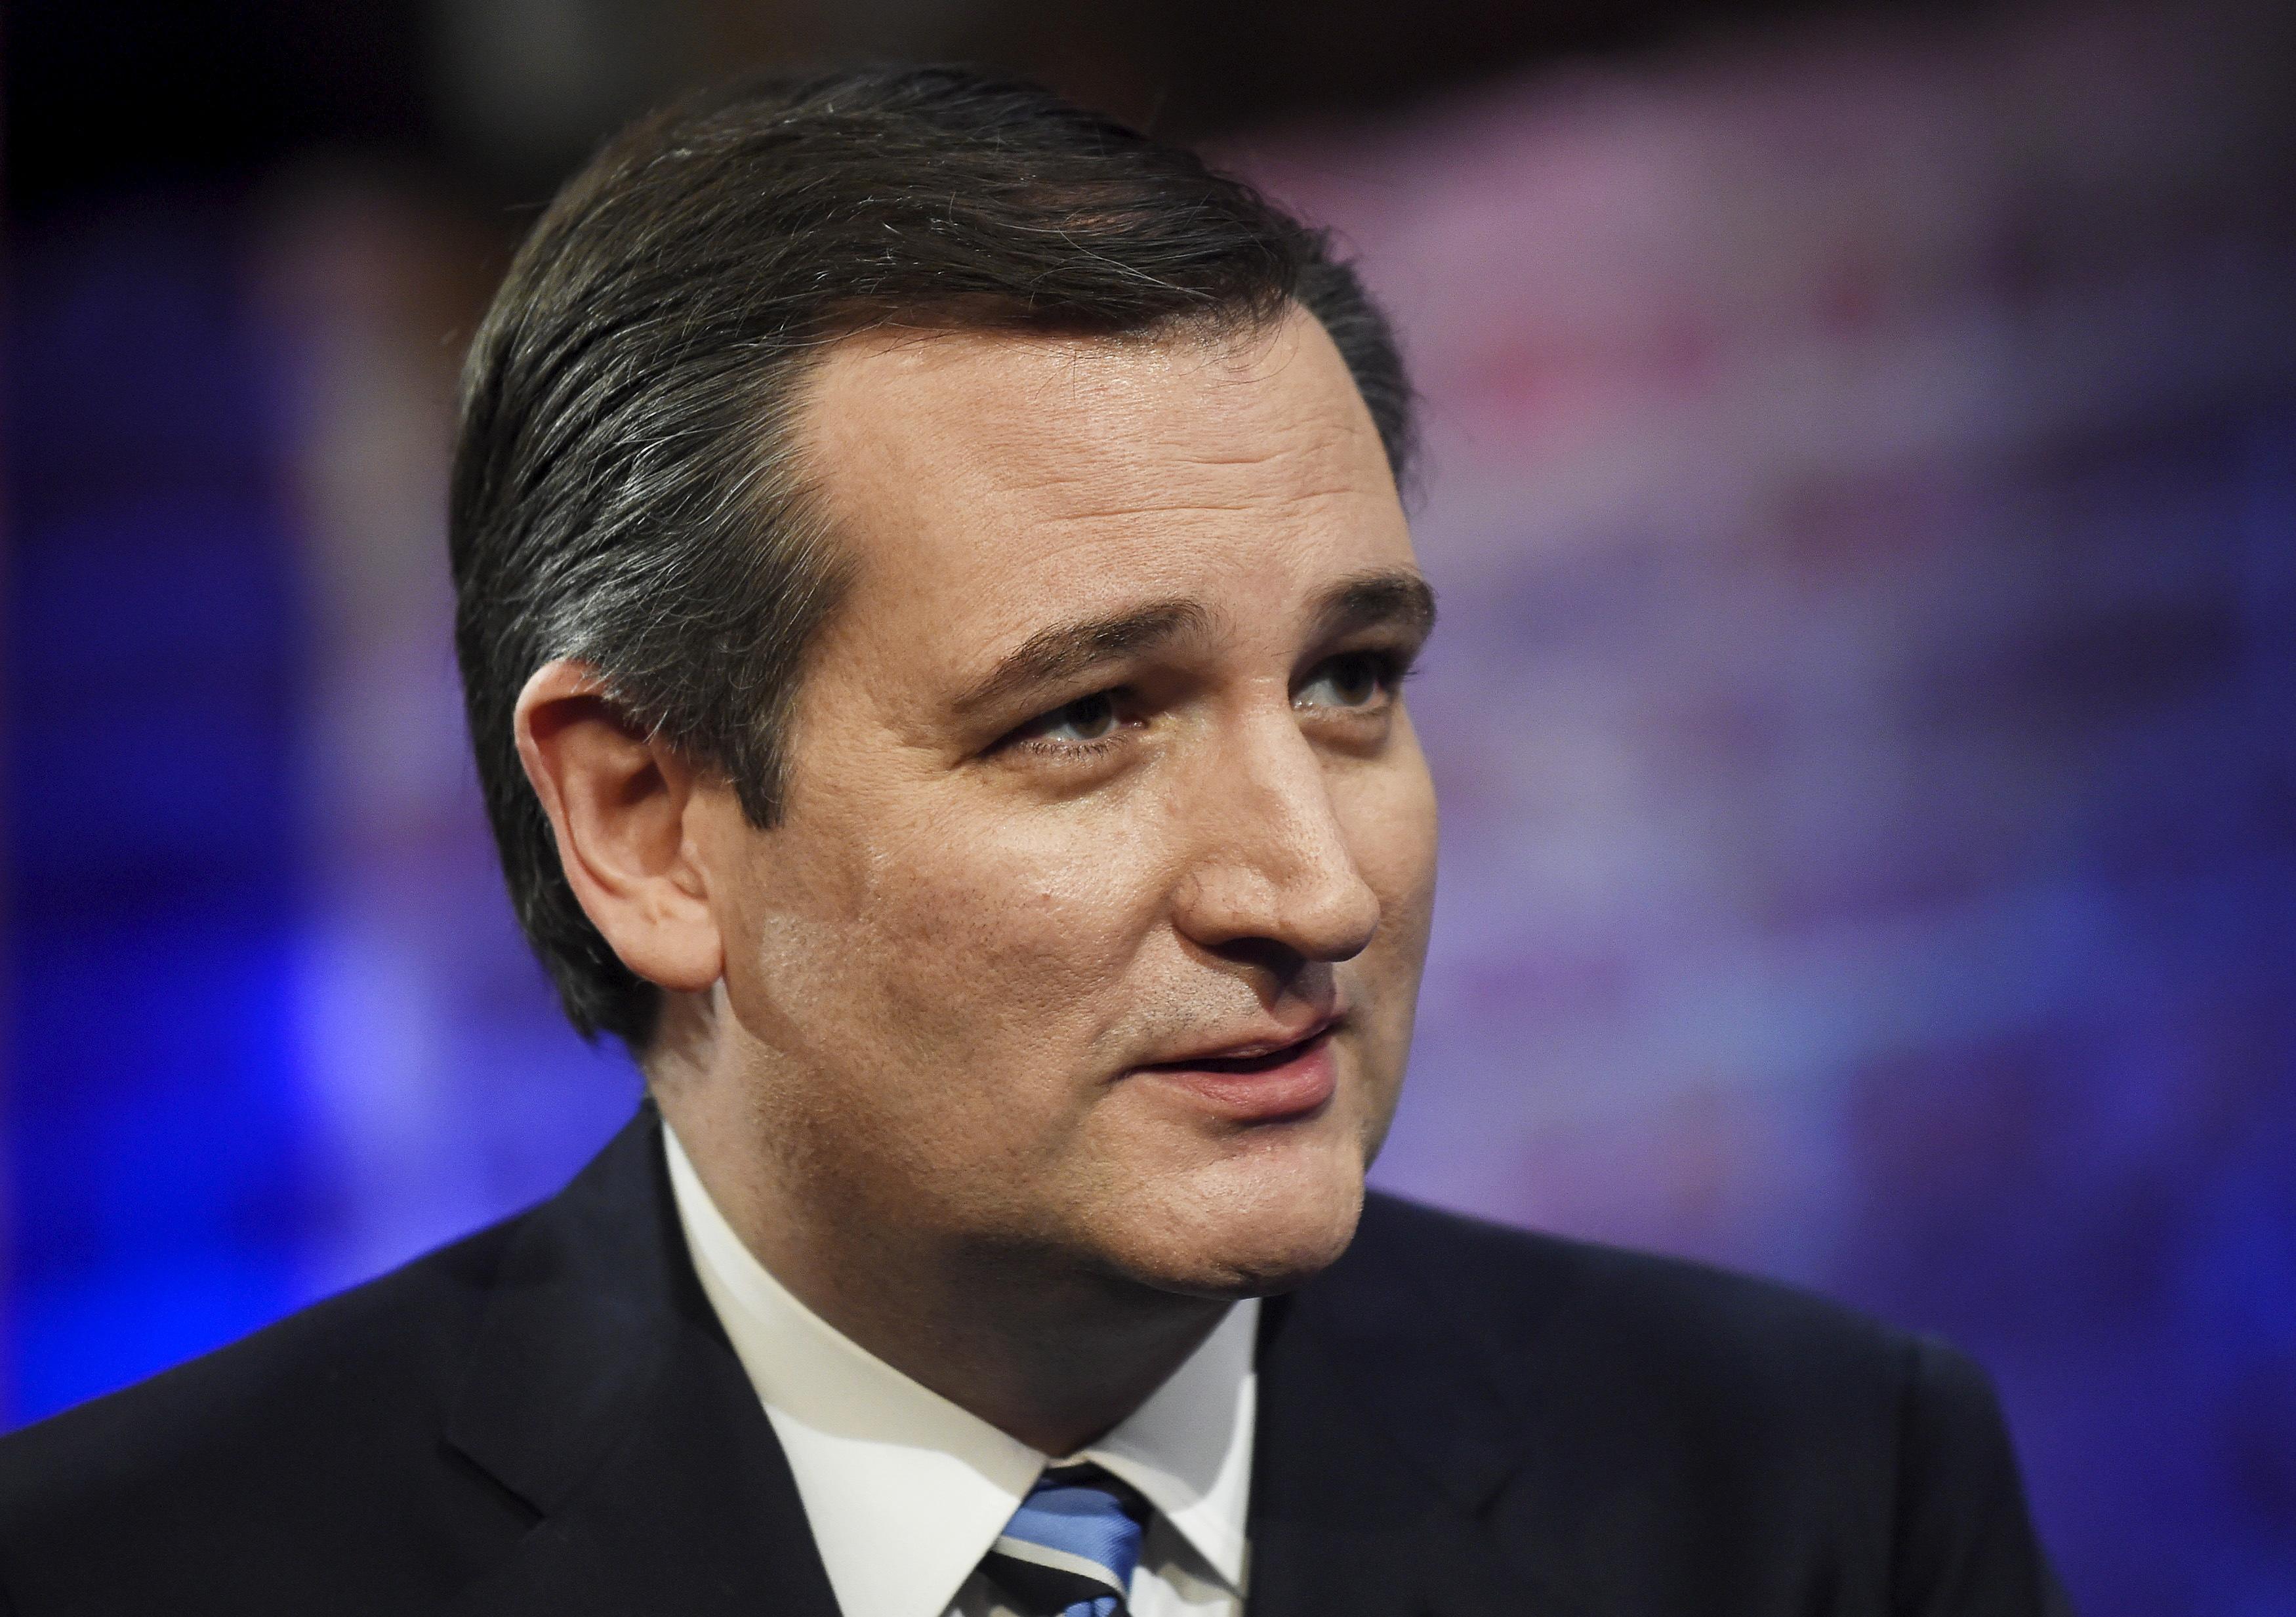 Ted Cruz Computer Backgrounds